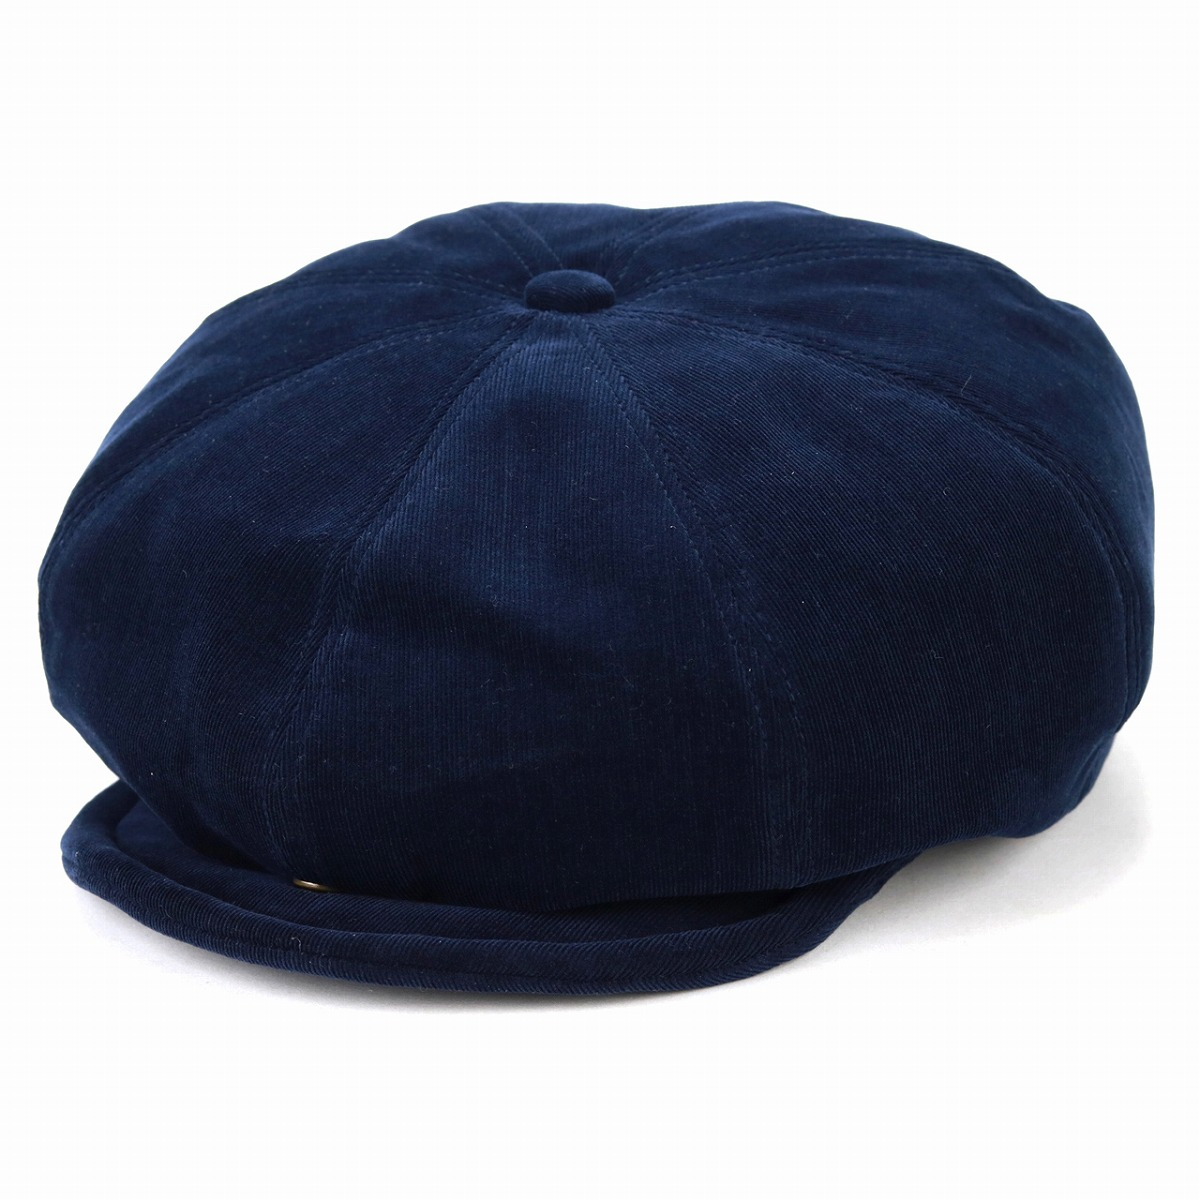 ... Brand luster 8 panel cotton 100L size   dark blue navy  newsboy cap   Christmas ... 86b1a2c306a0